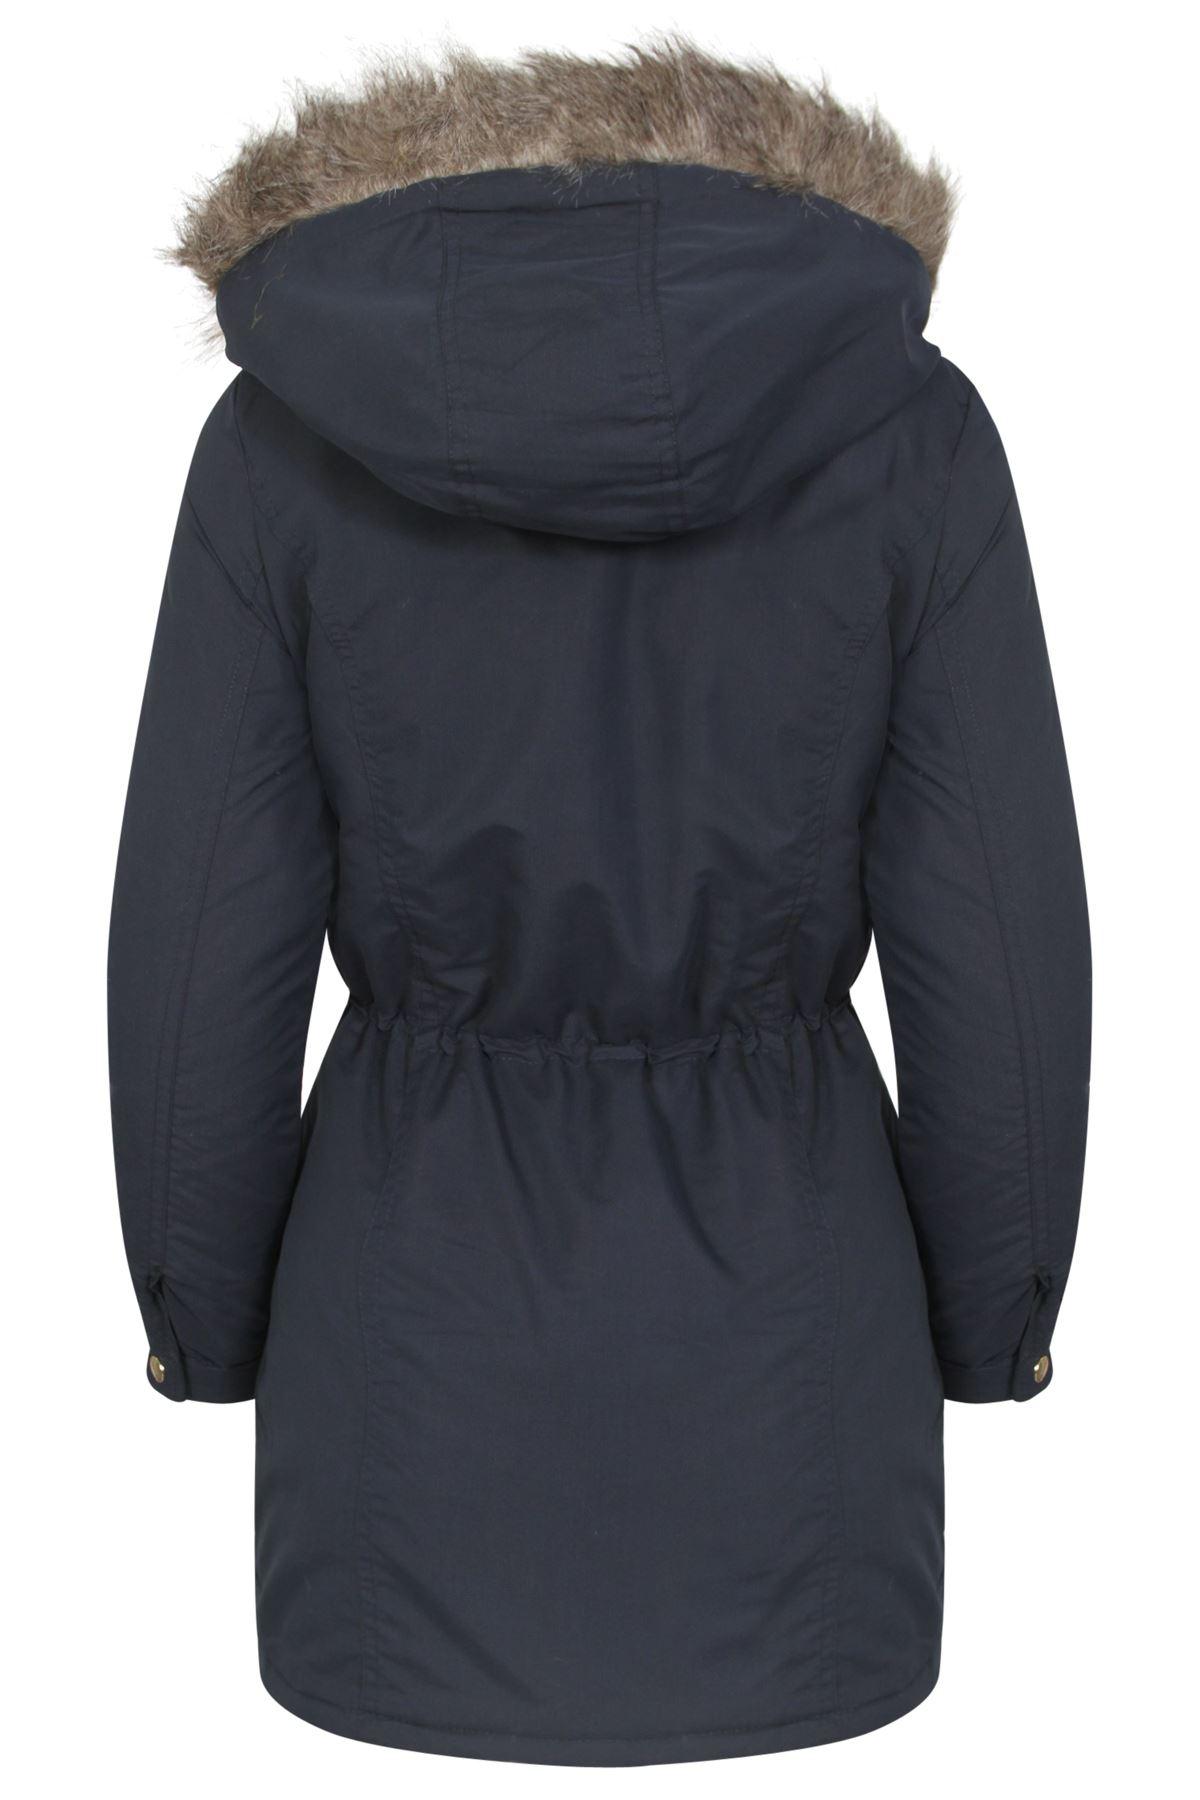 Womens-Brave-Soul-Plain-Trimmed-Parka-Faux-Fur-Hooded-Winter-Jacket-Long-Coat thumbnail 9